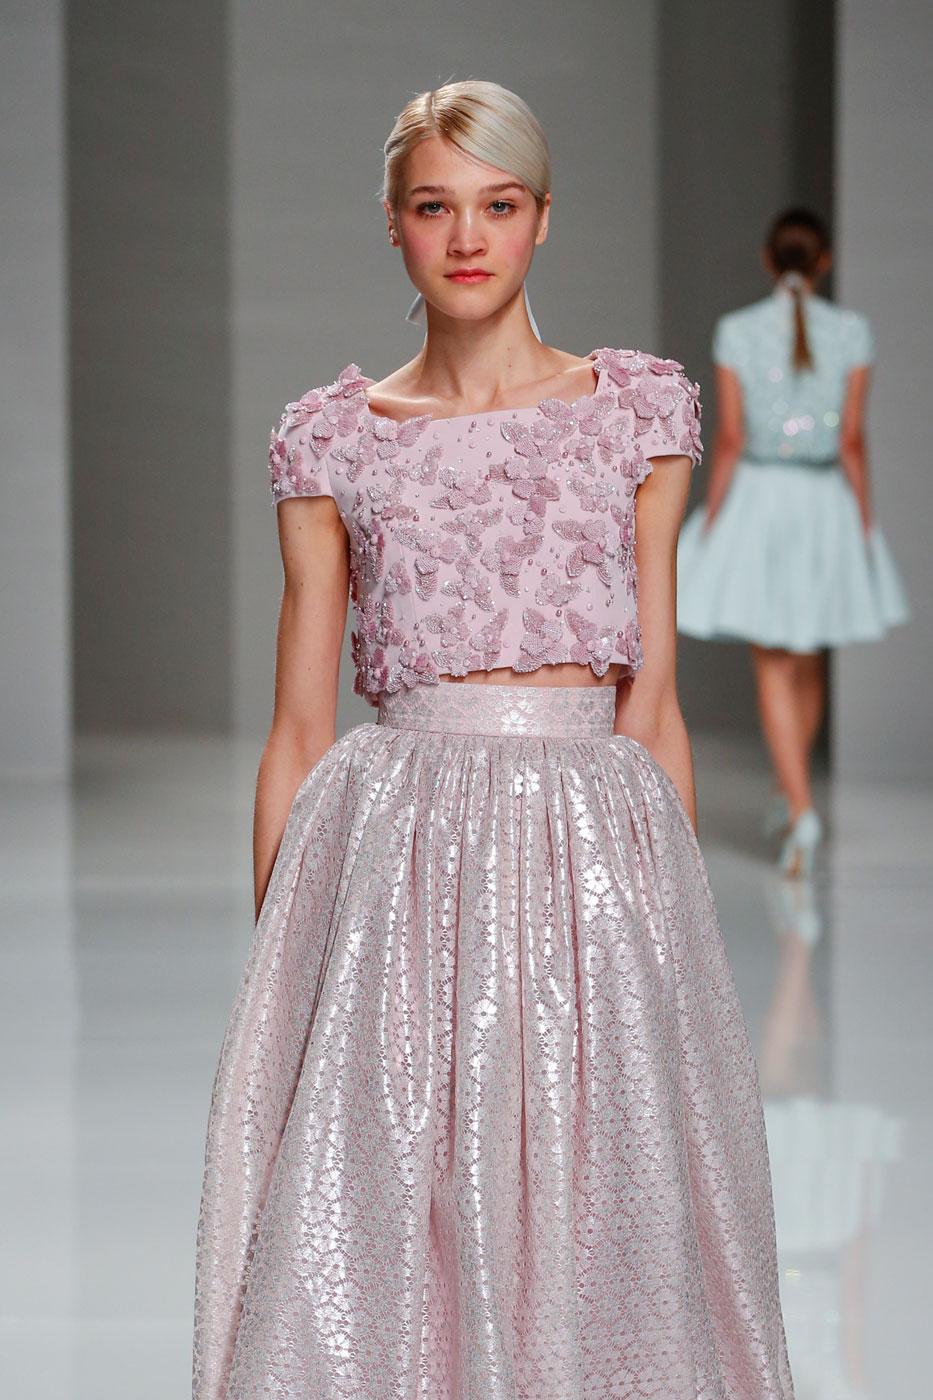 Georges-Hobeika-fashion-runway-show-haute-couture-paris-spring-2015-the-impression-14